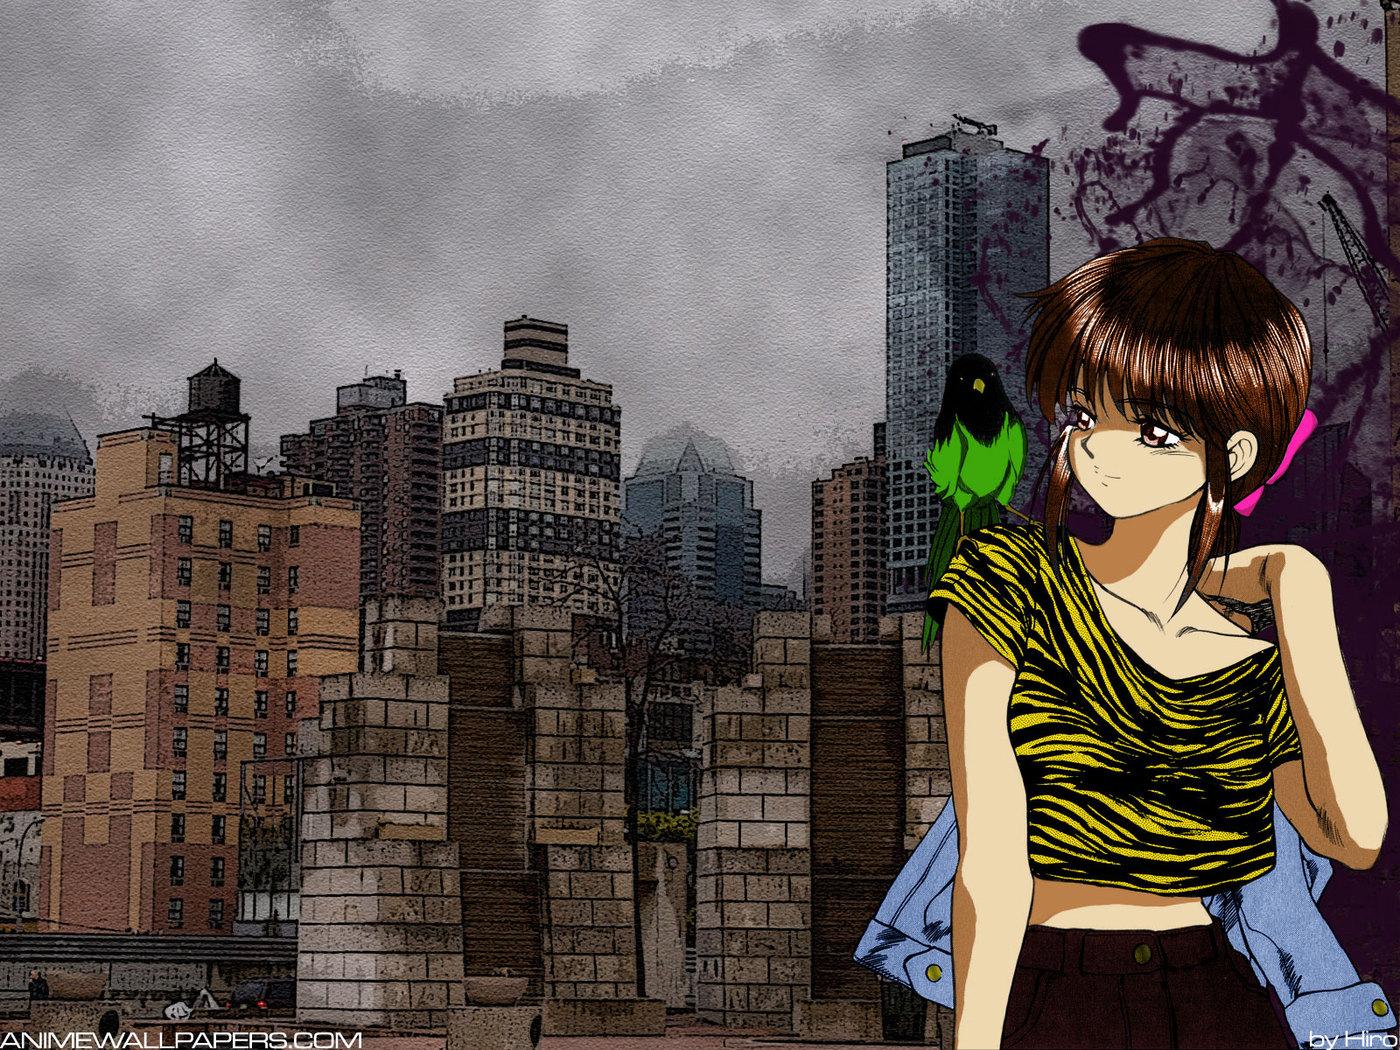 3x3 Eyes Anime Wallpaper # 2